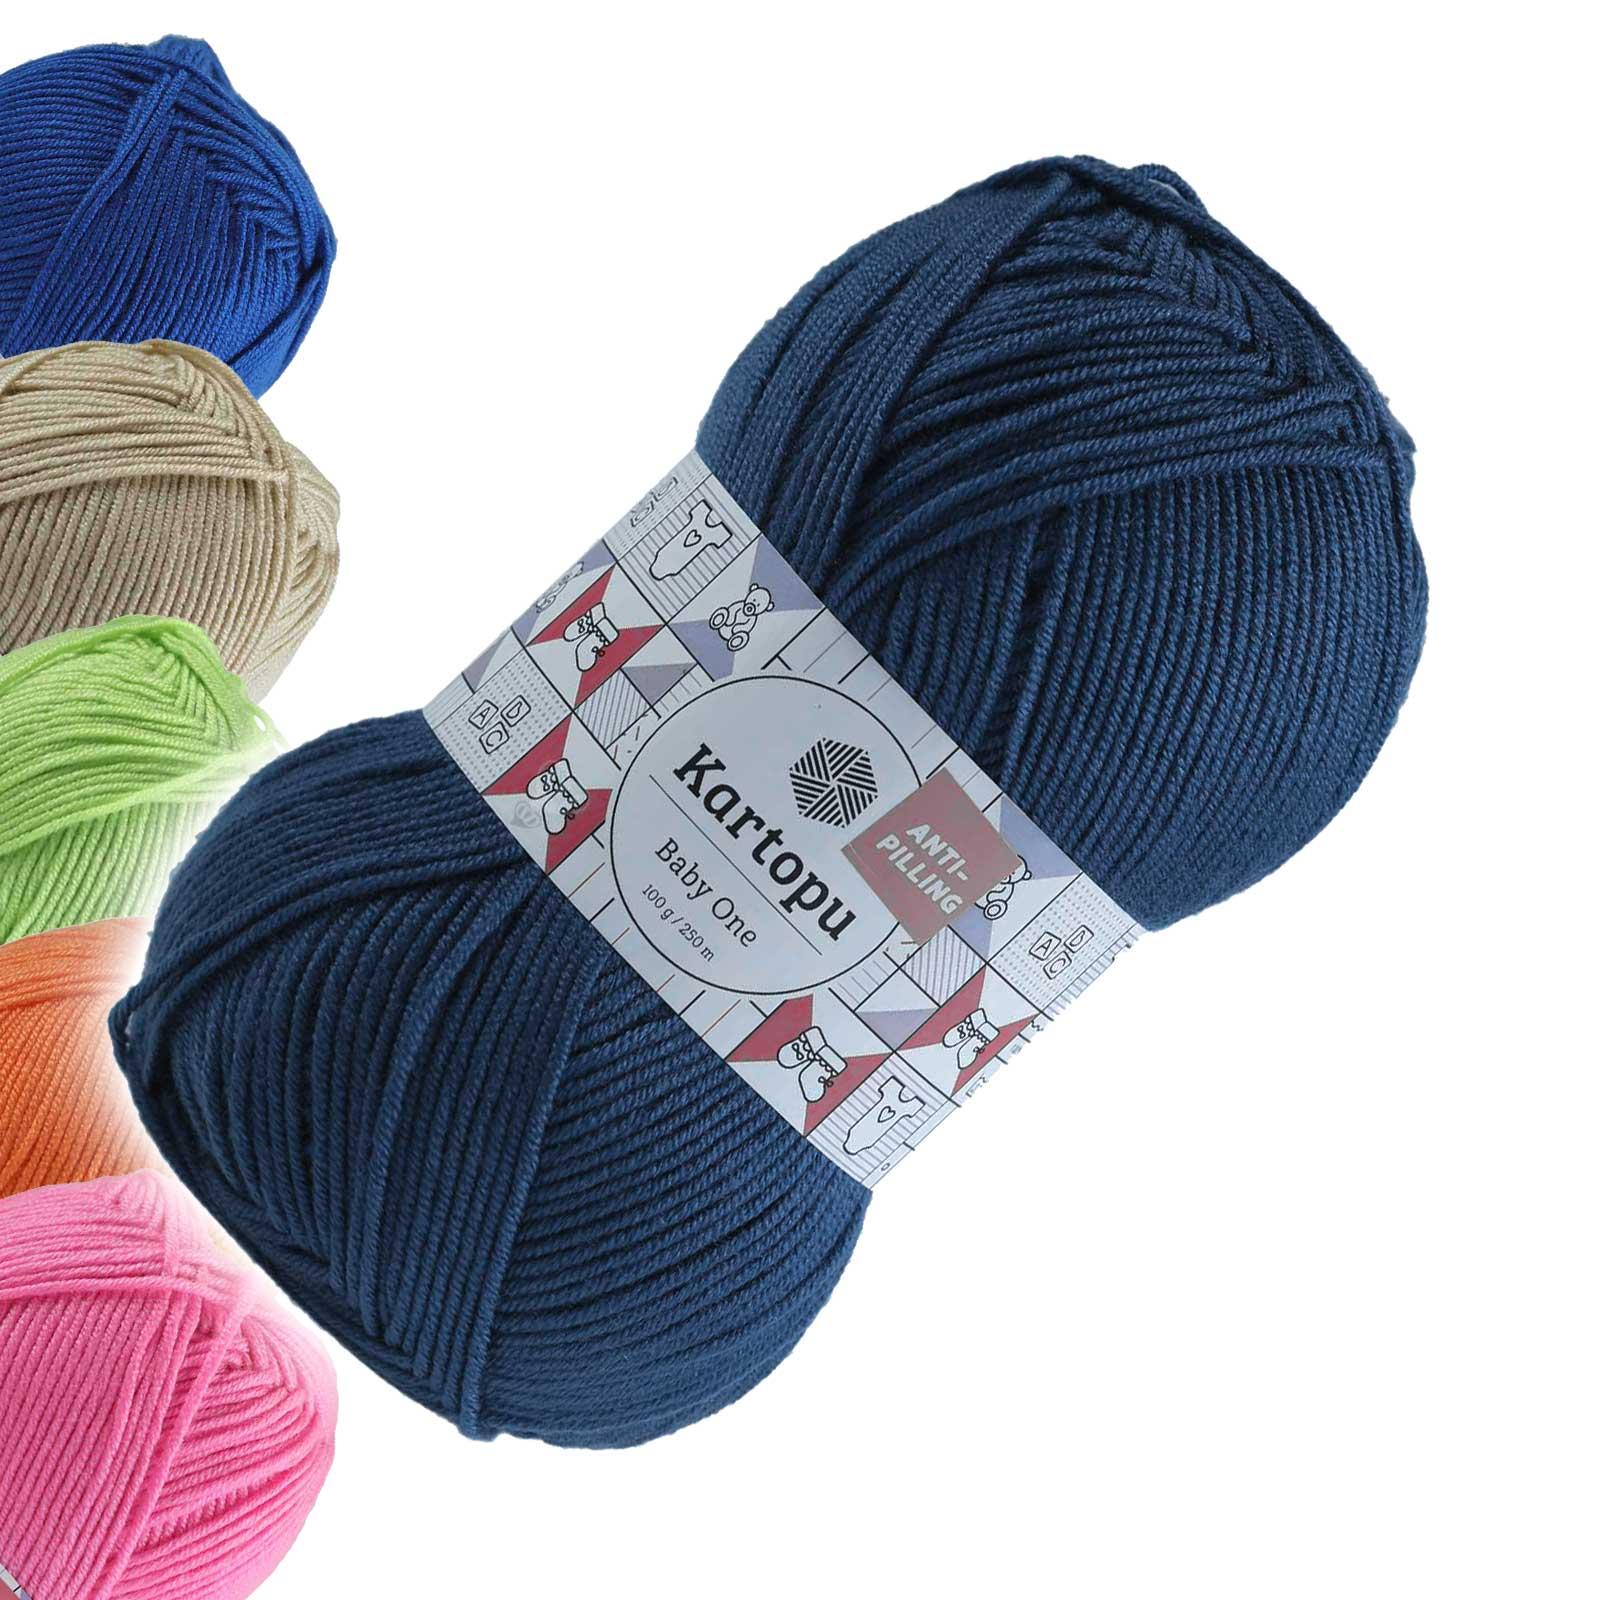 100g Strickgarn Kartopu BABY ONE Antipilling Babywolle Babystrickgarn, Farbwahl – Bild 12